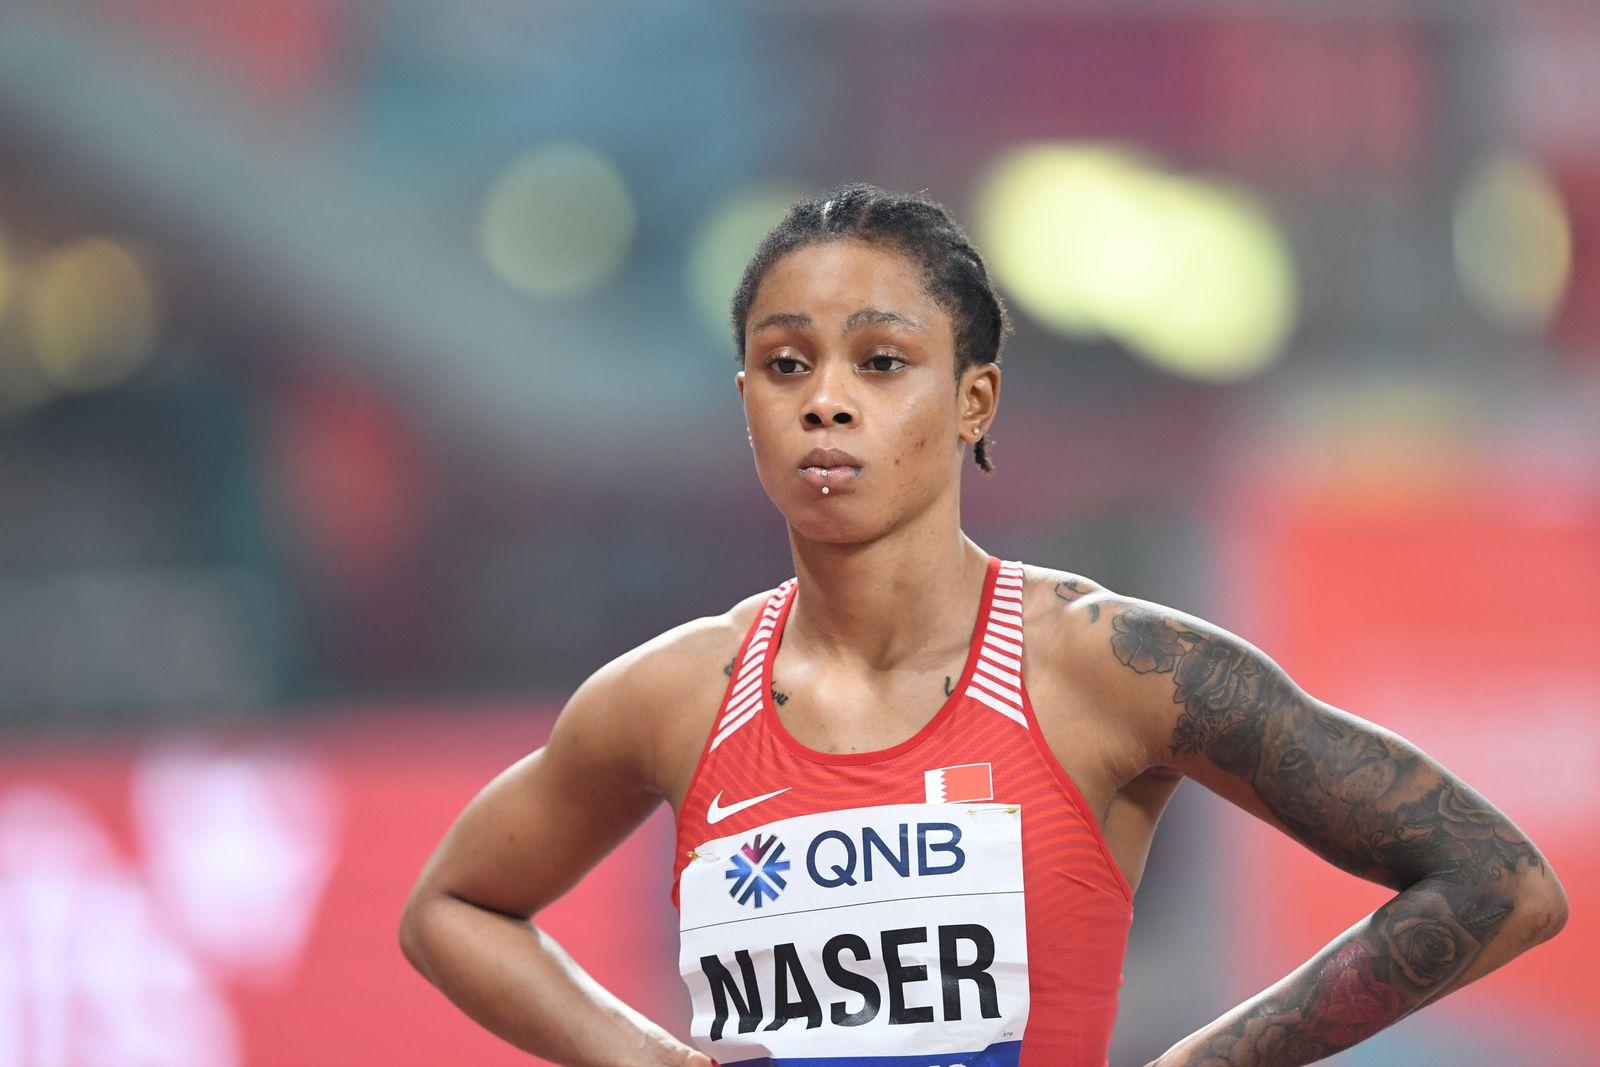 Doha, IAAF, Leichtathletik, athletics, Track and Field, World athletics Championships 2019 Doha, Leichtathletik WM 2019